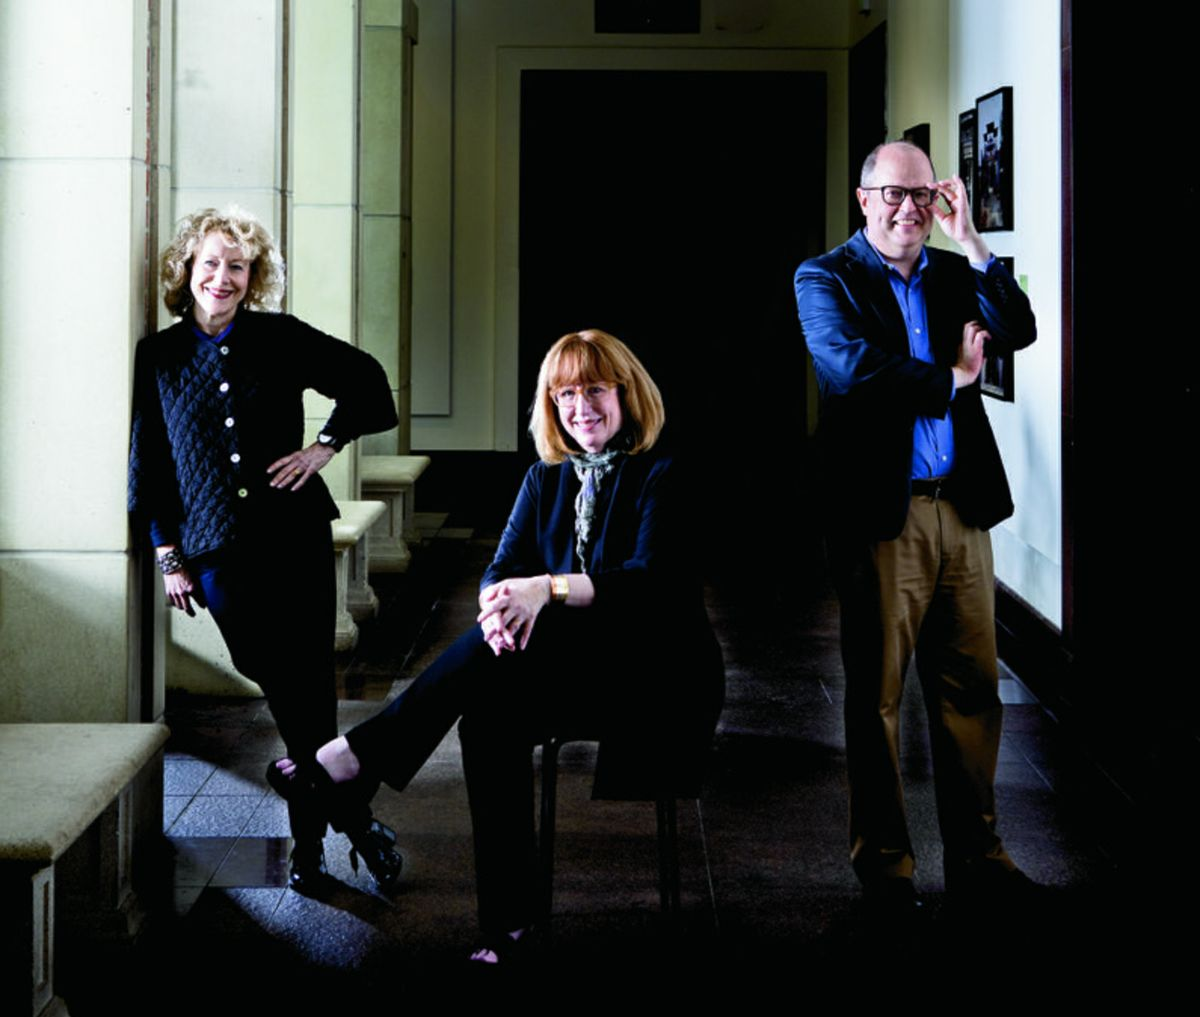 Marla Berns, Cindy Burlingham and Matthew Robb